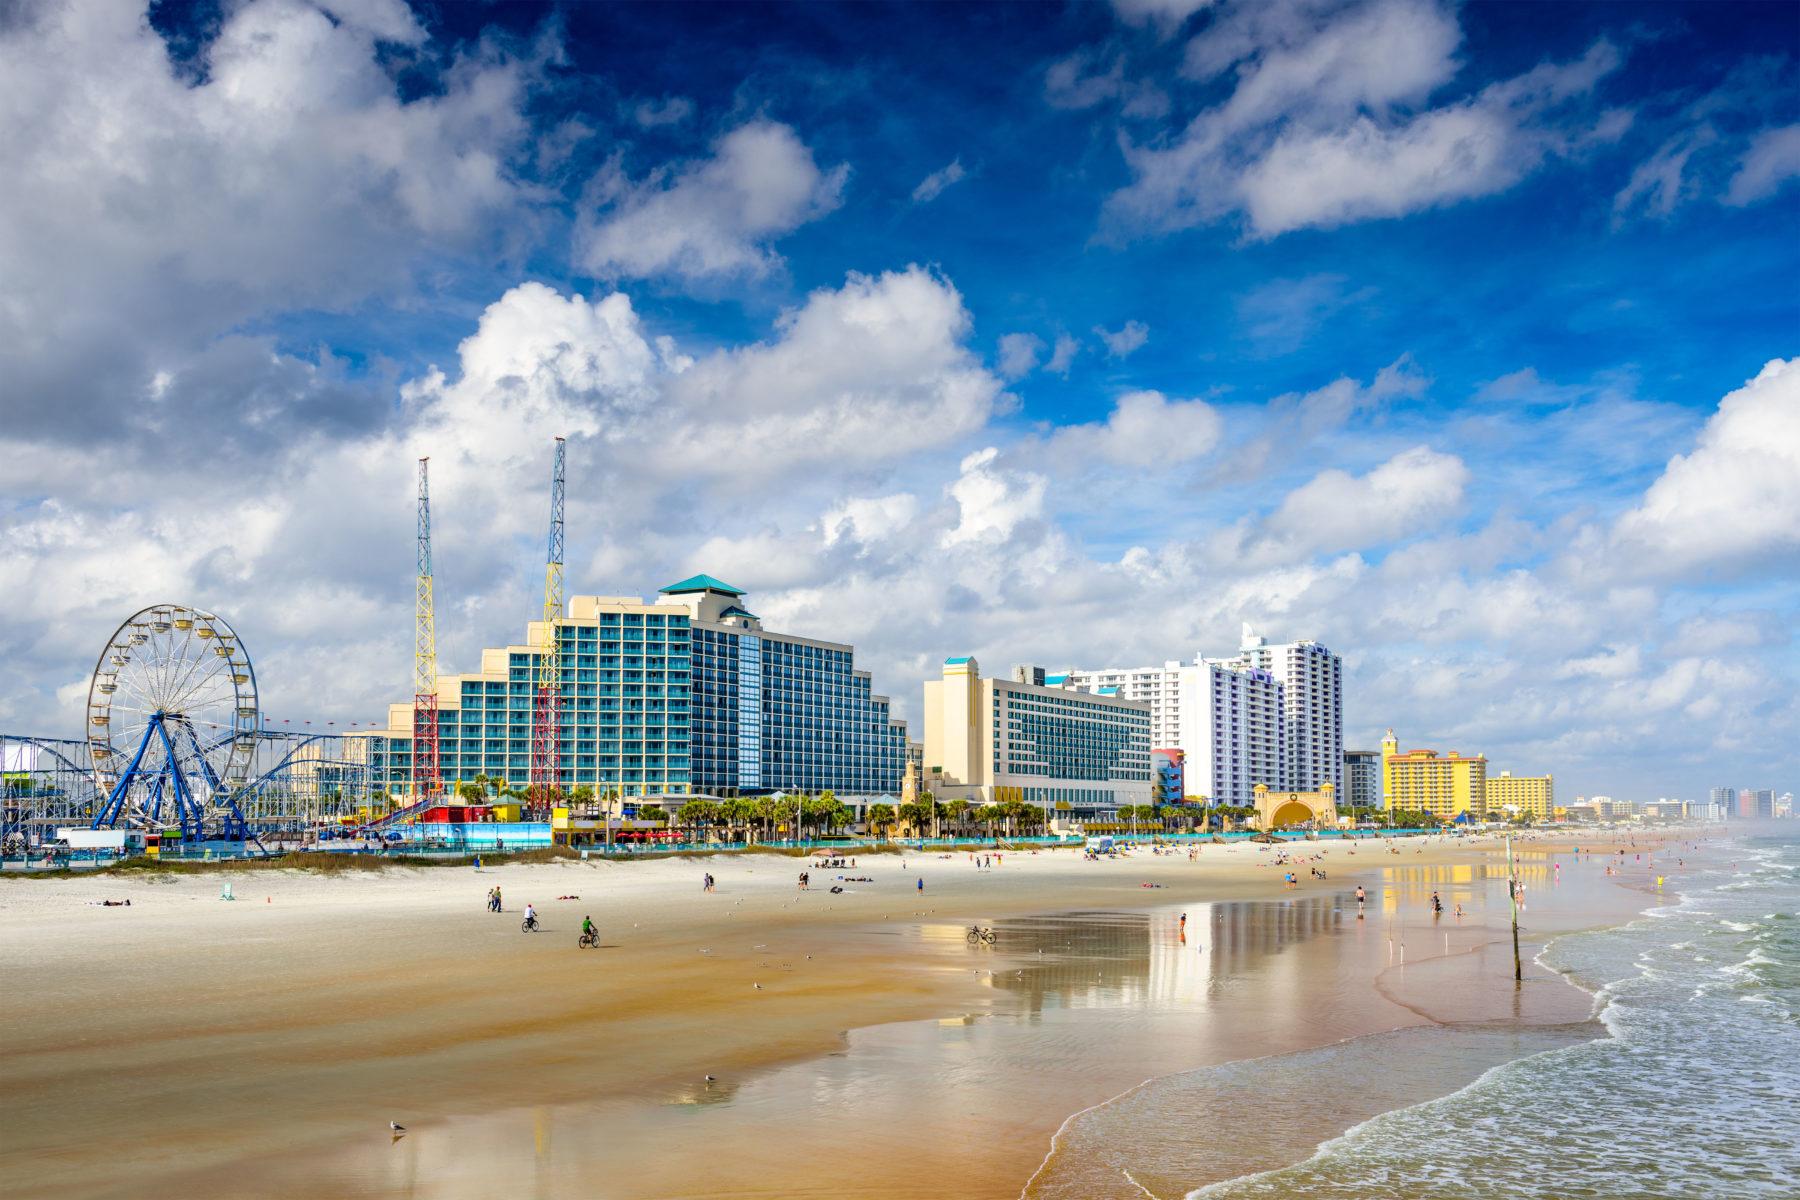 Orlando's closest beaches